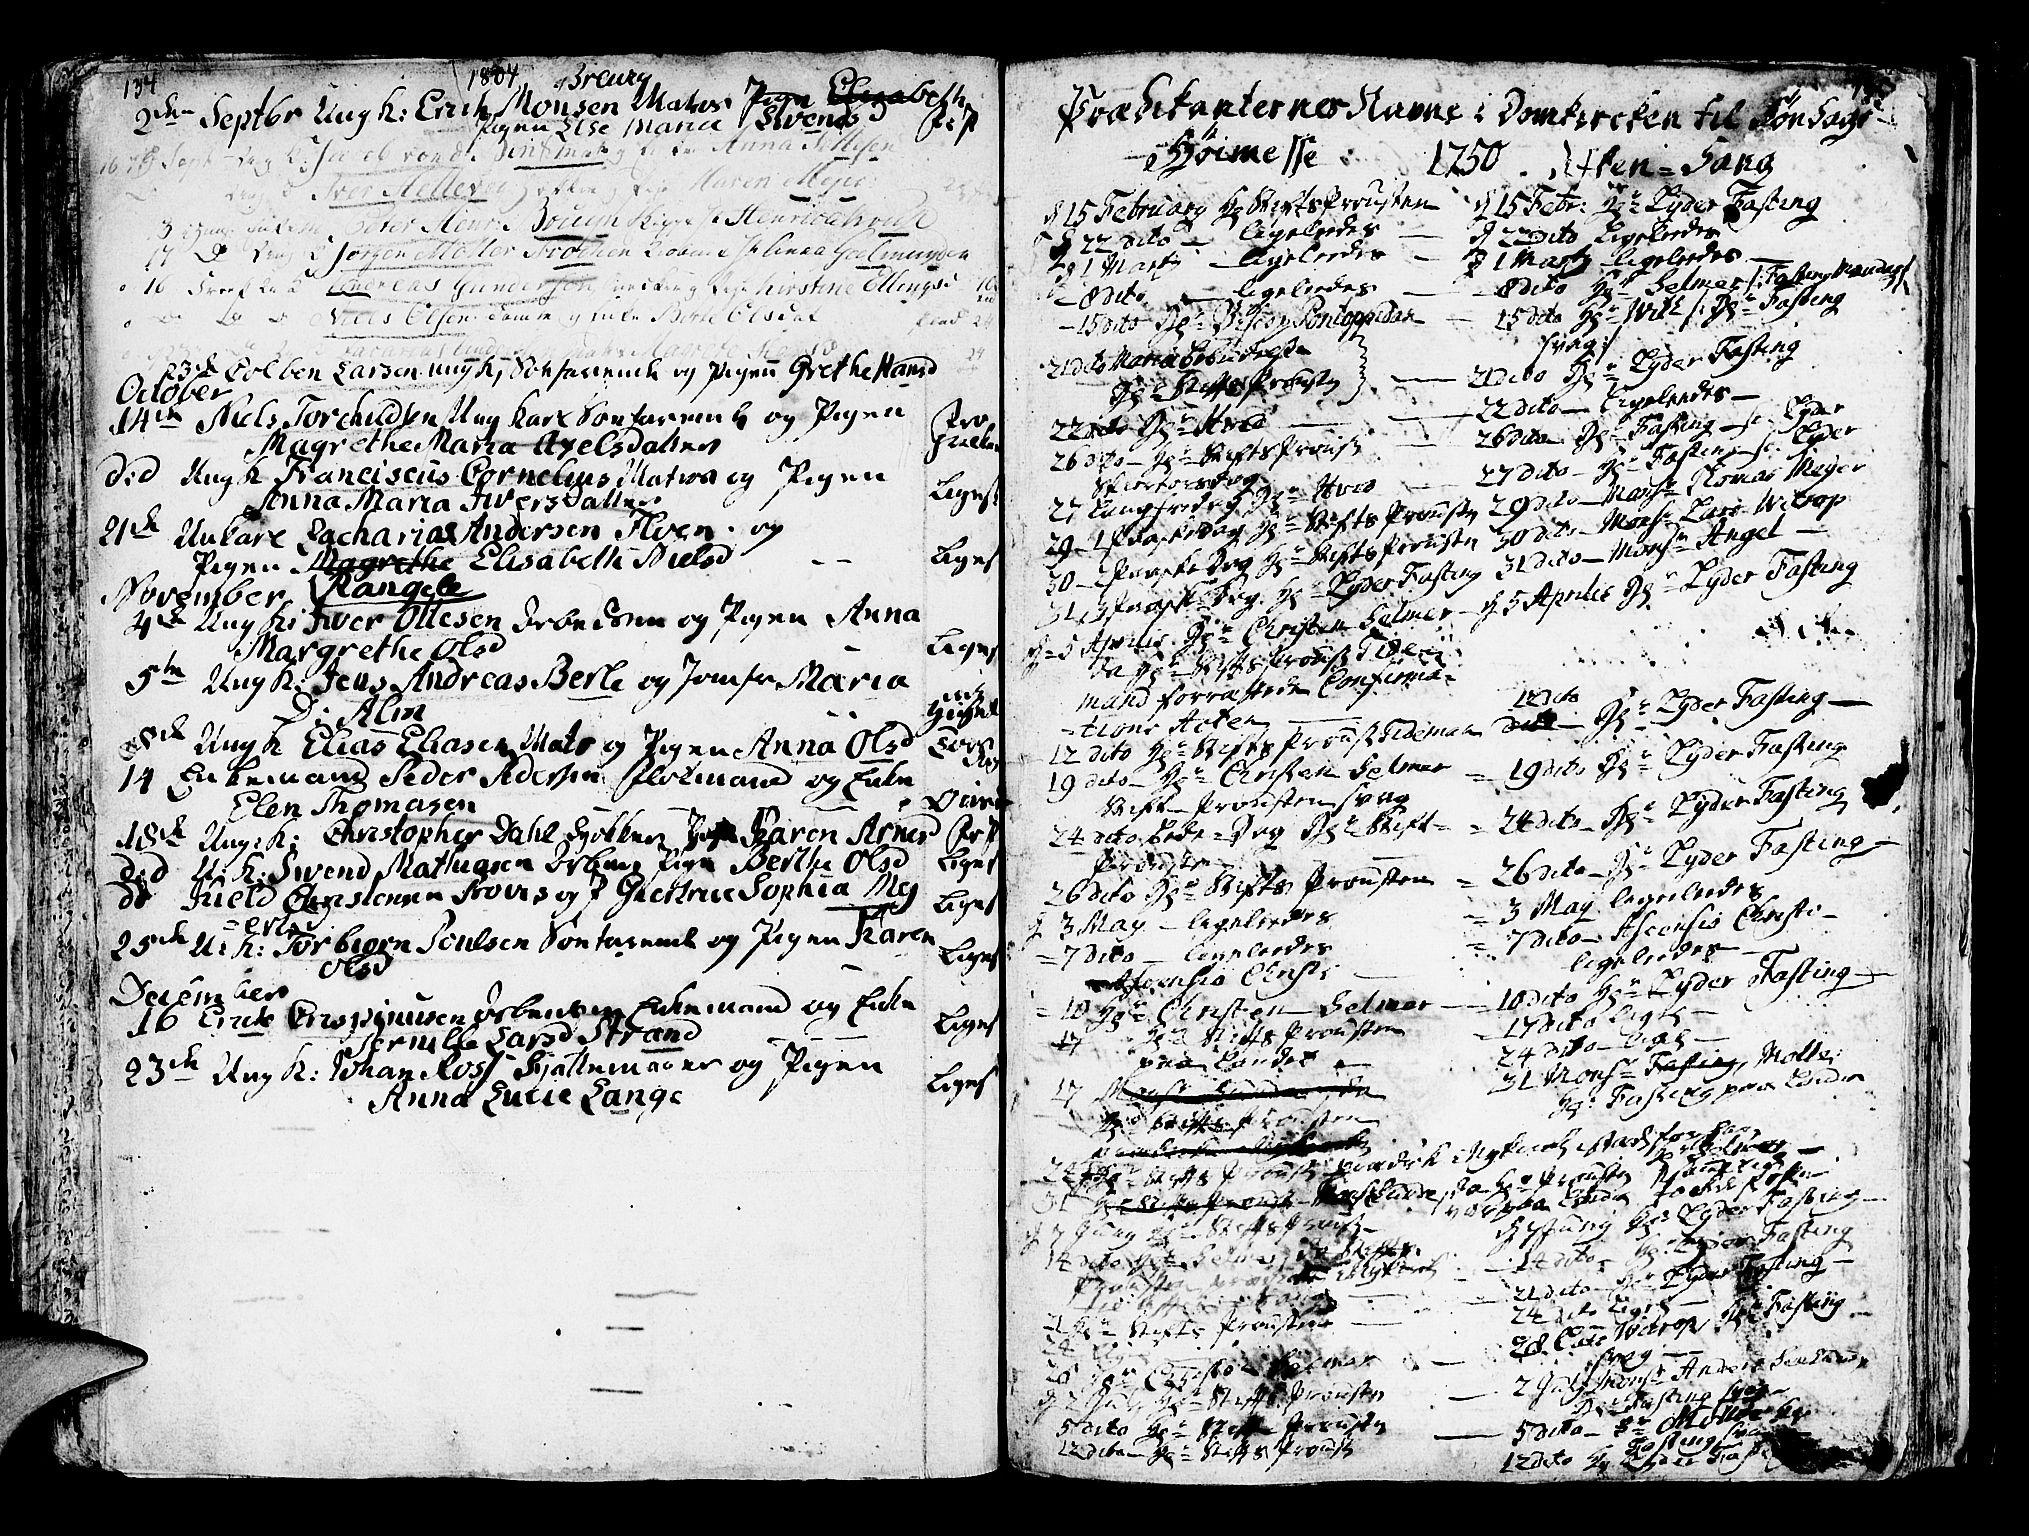 SAB, Domkirken sokneprestembete, H/Haa/L0007: Parish register (official) no. A 7, 1725-1826, p. 134-135